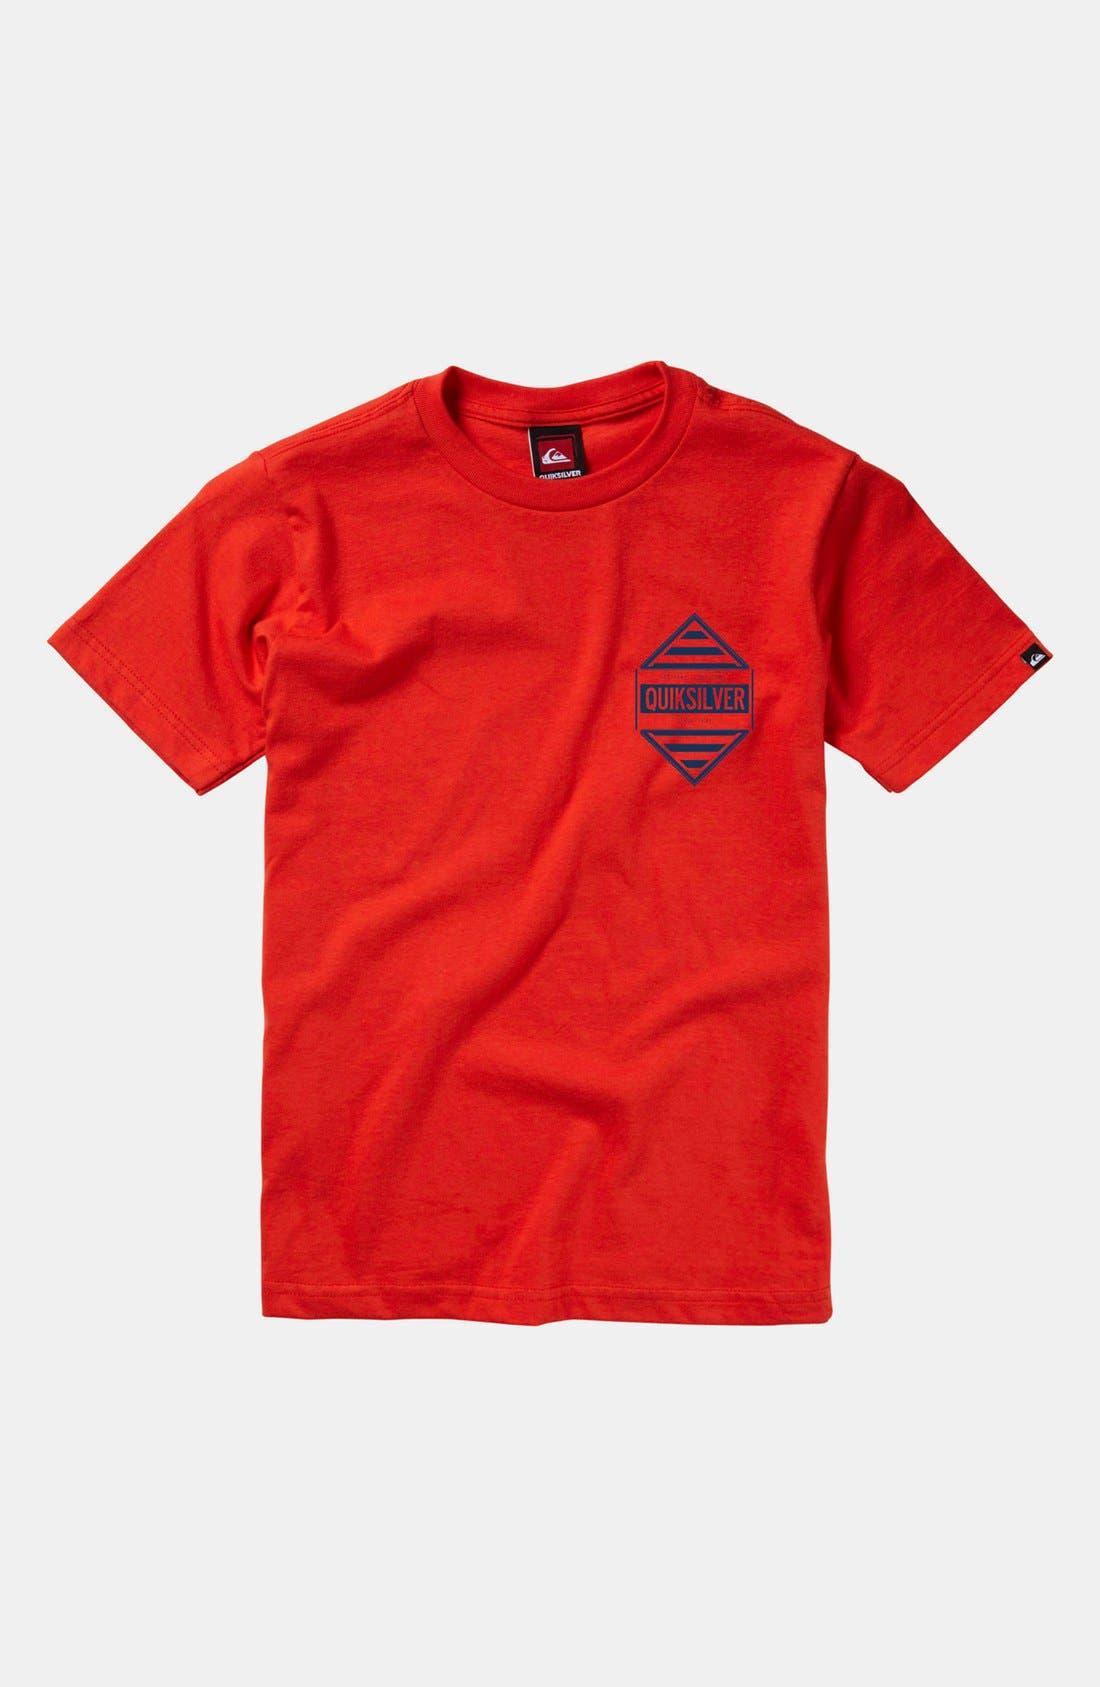 Alternate Image 1 Selected - Quiksilver 'Answer' T-Shirt (Little Boys & Big Boys)